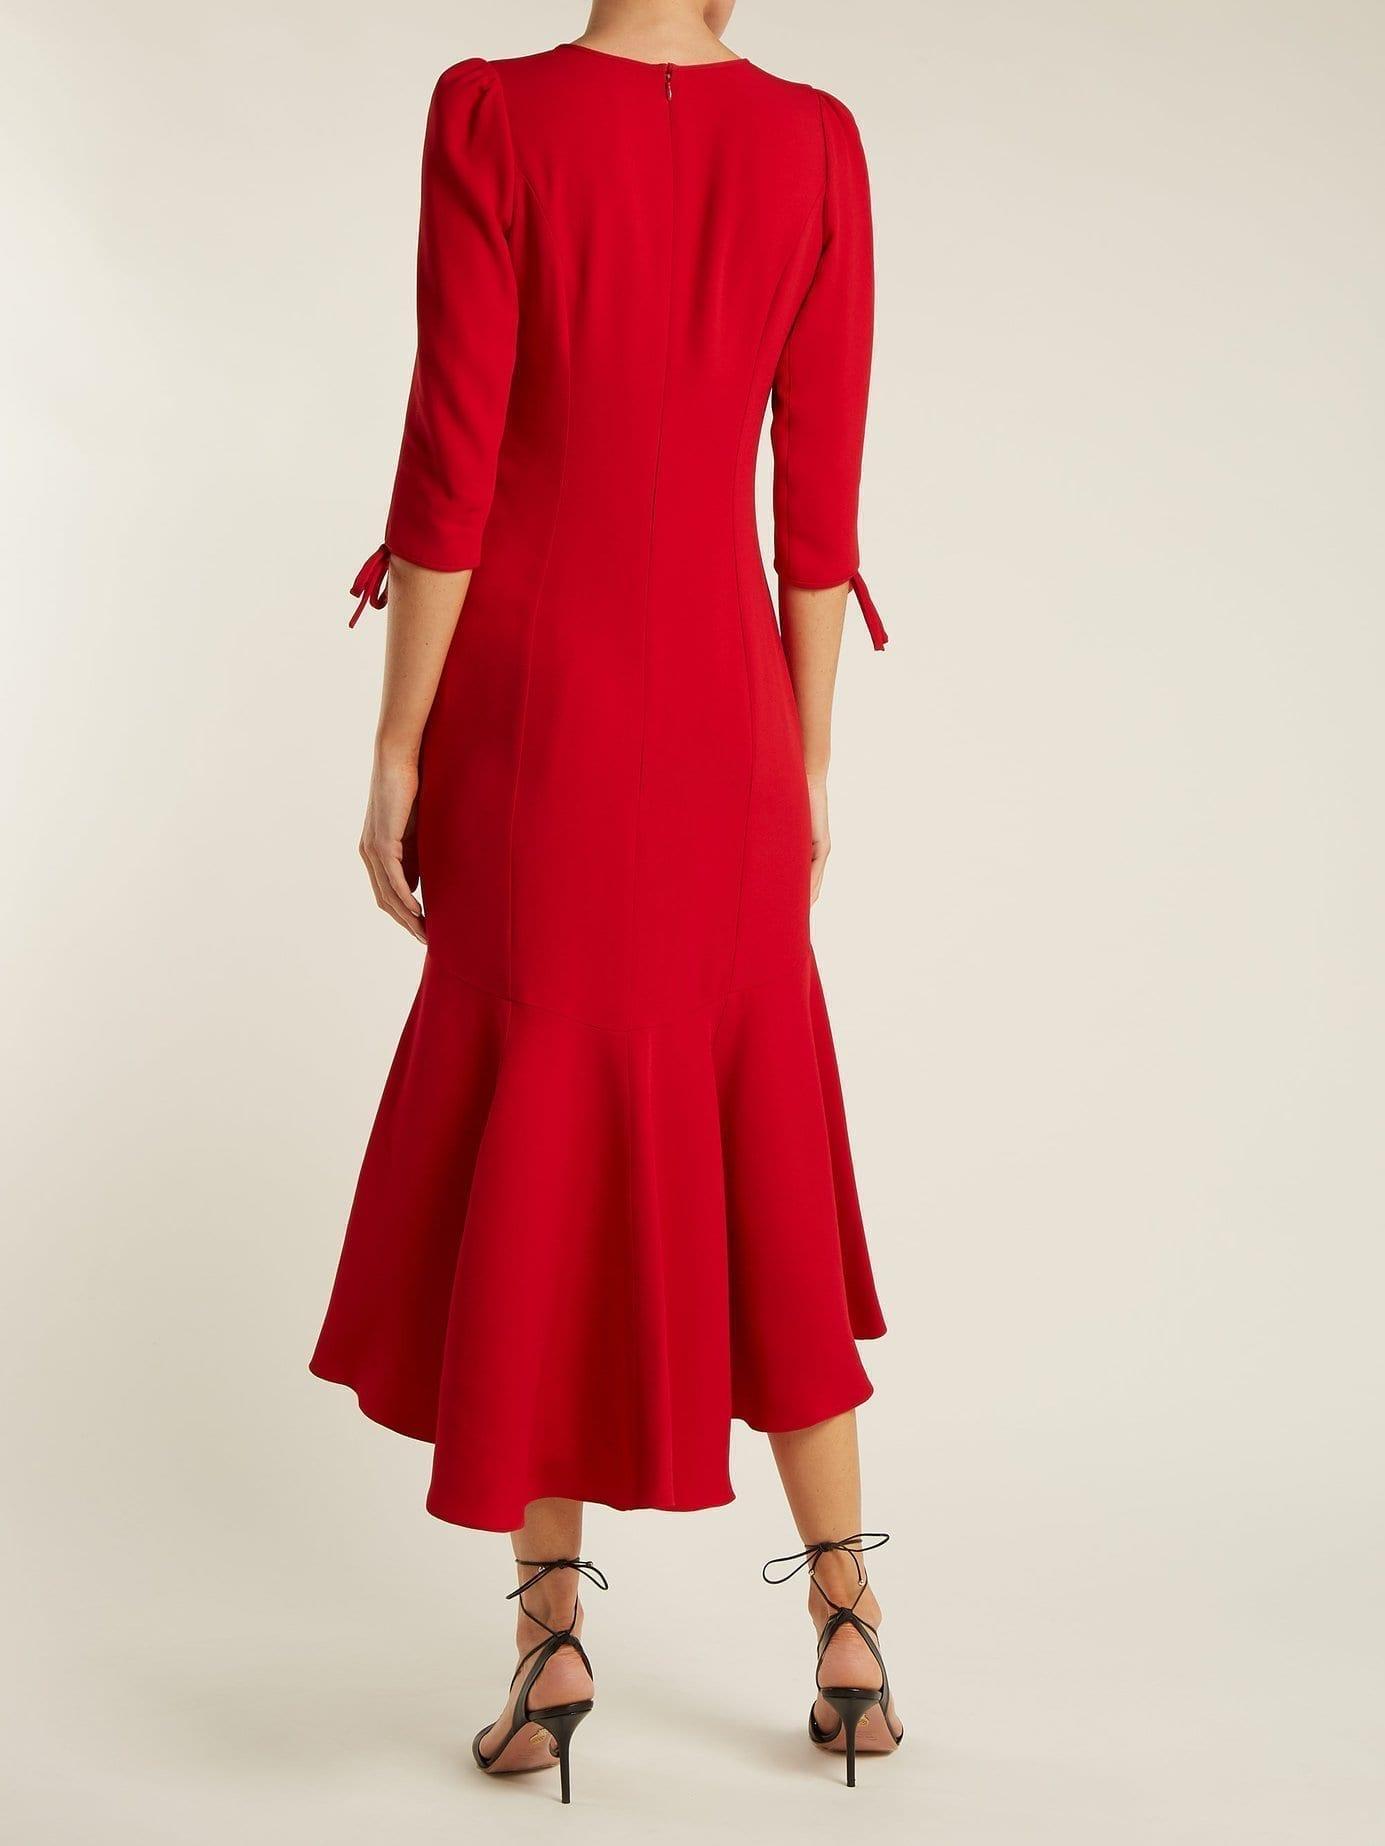 ANDREW GN Flower Appliqué Crepe Midi Red Dress